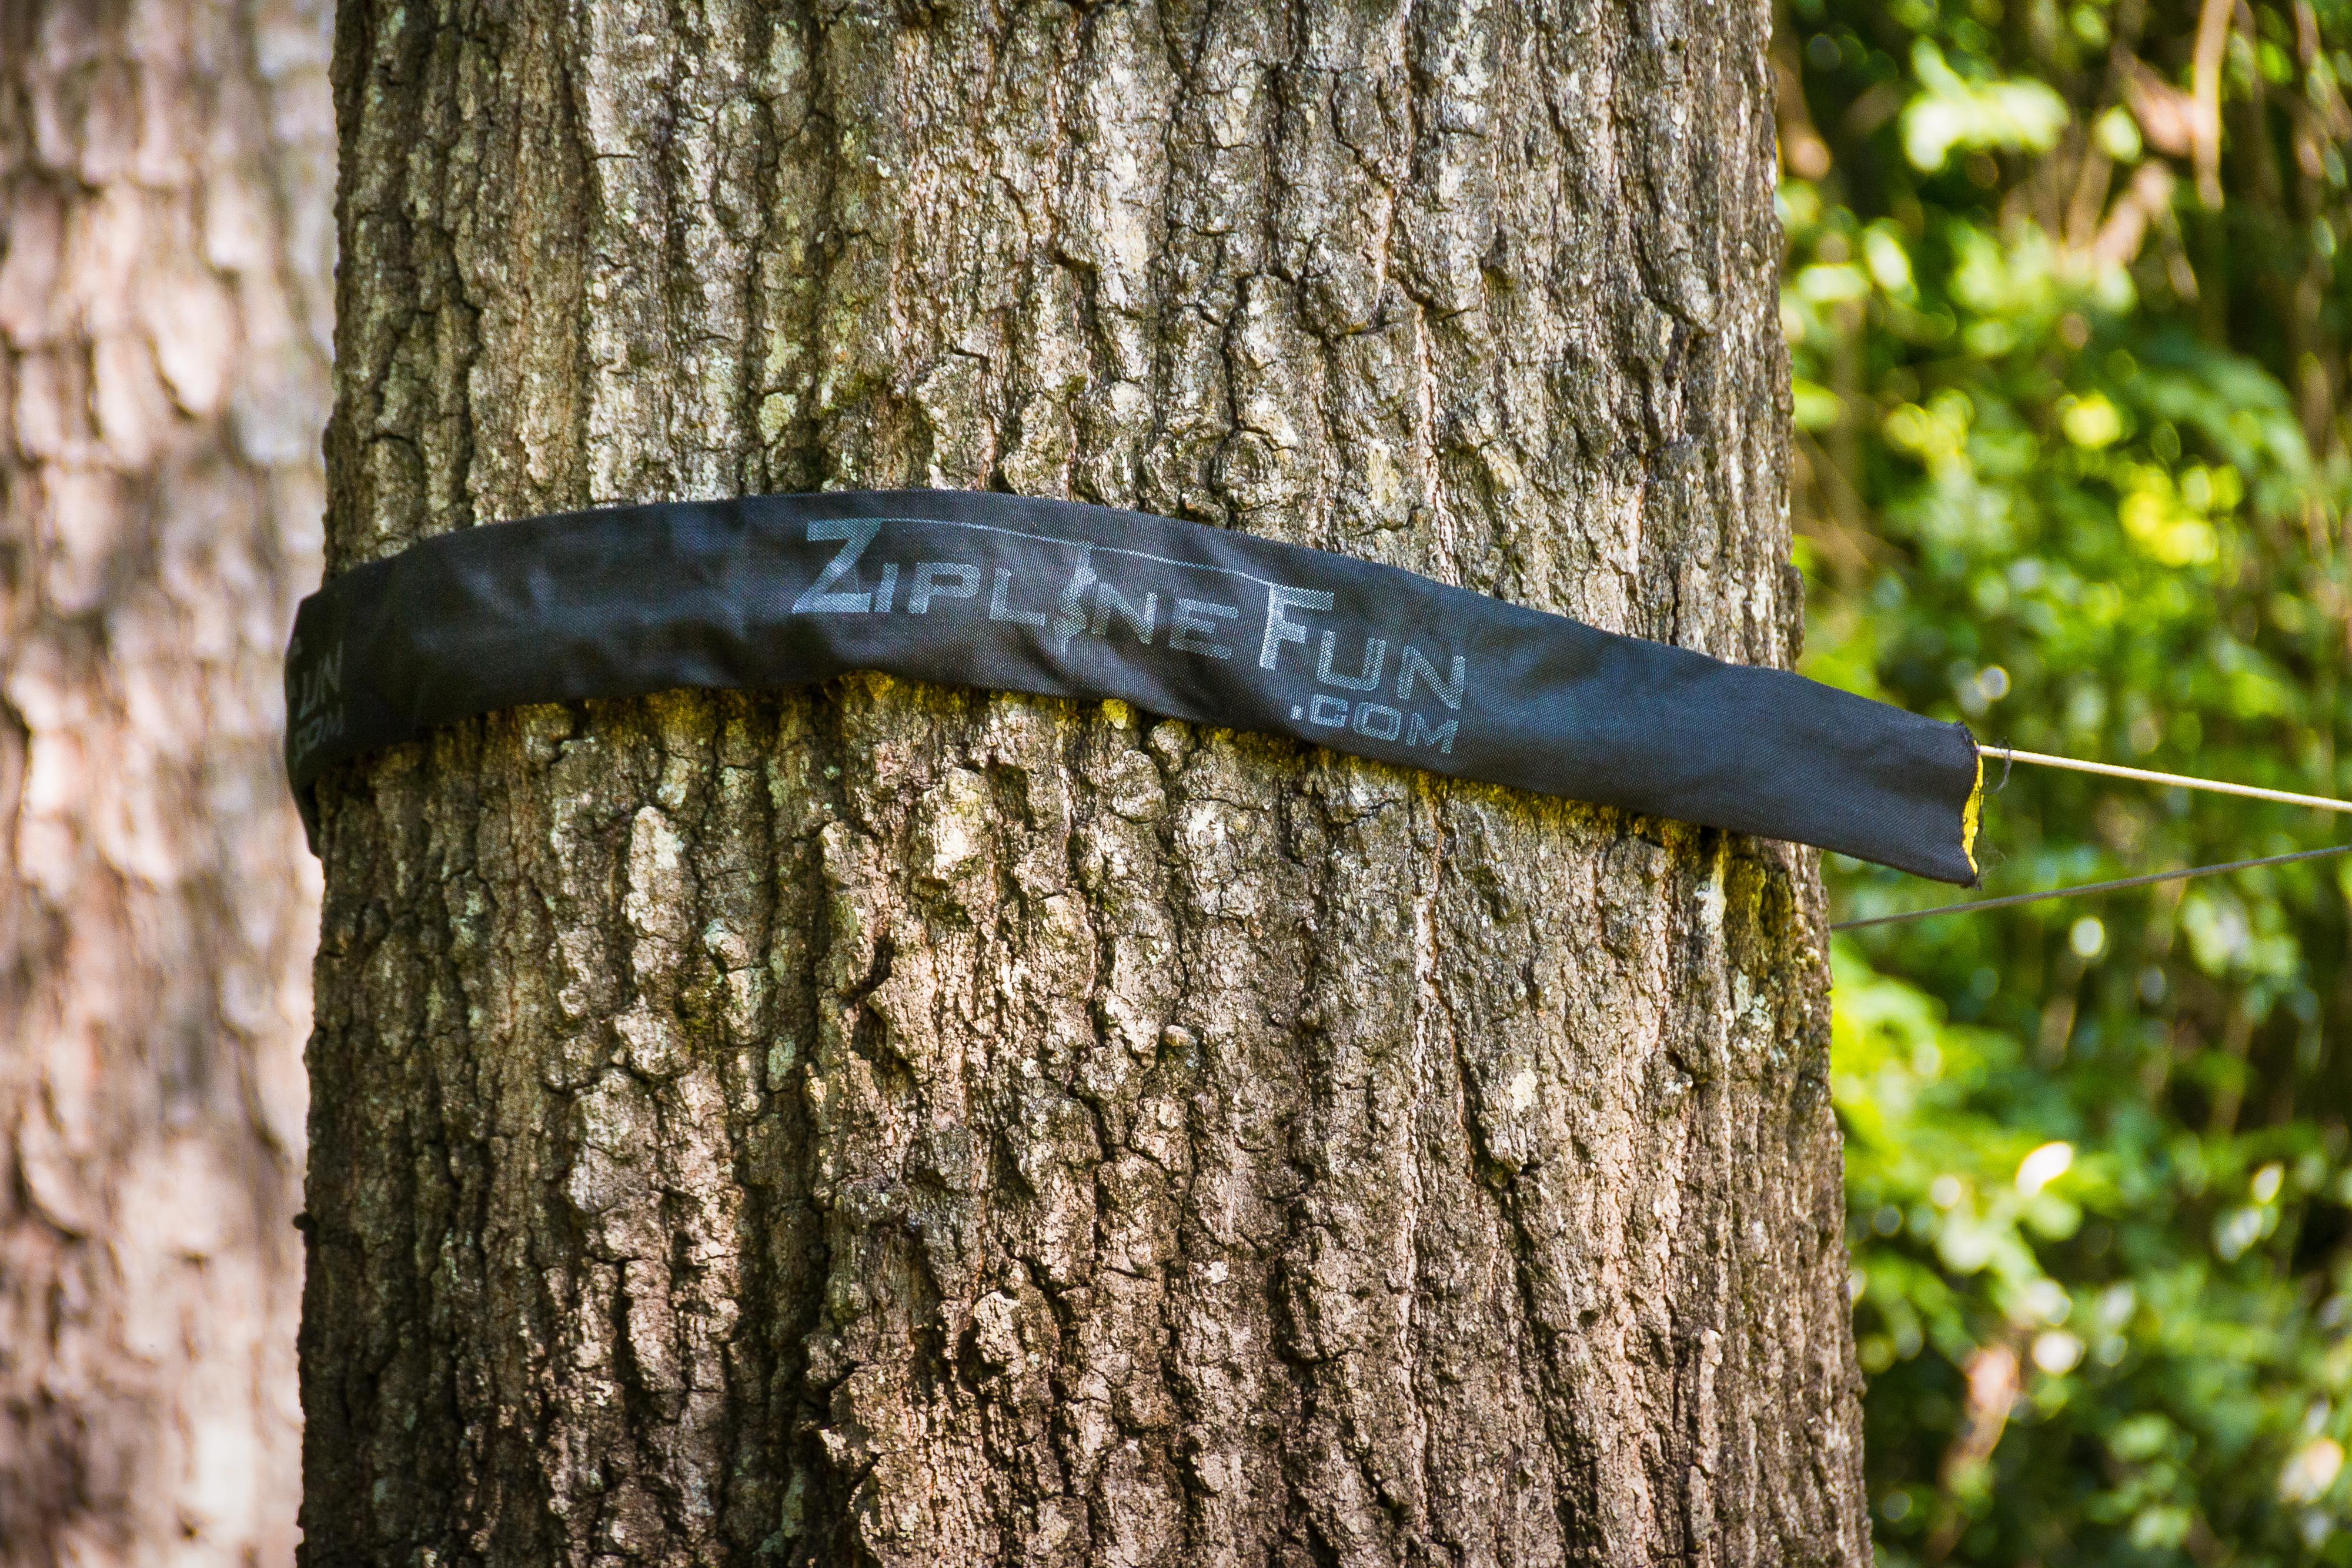 tree-protector-installed.jpg